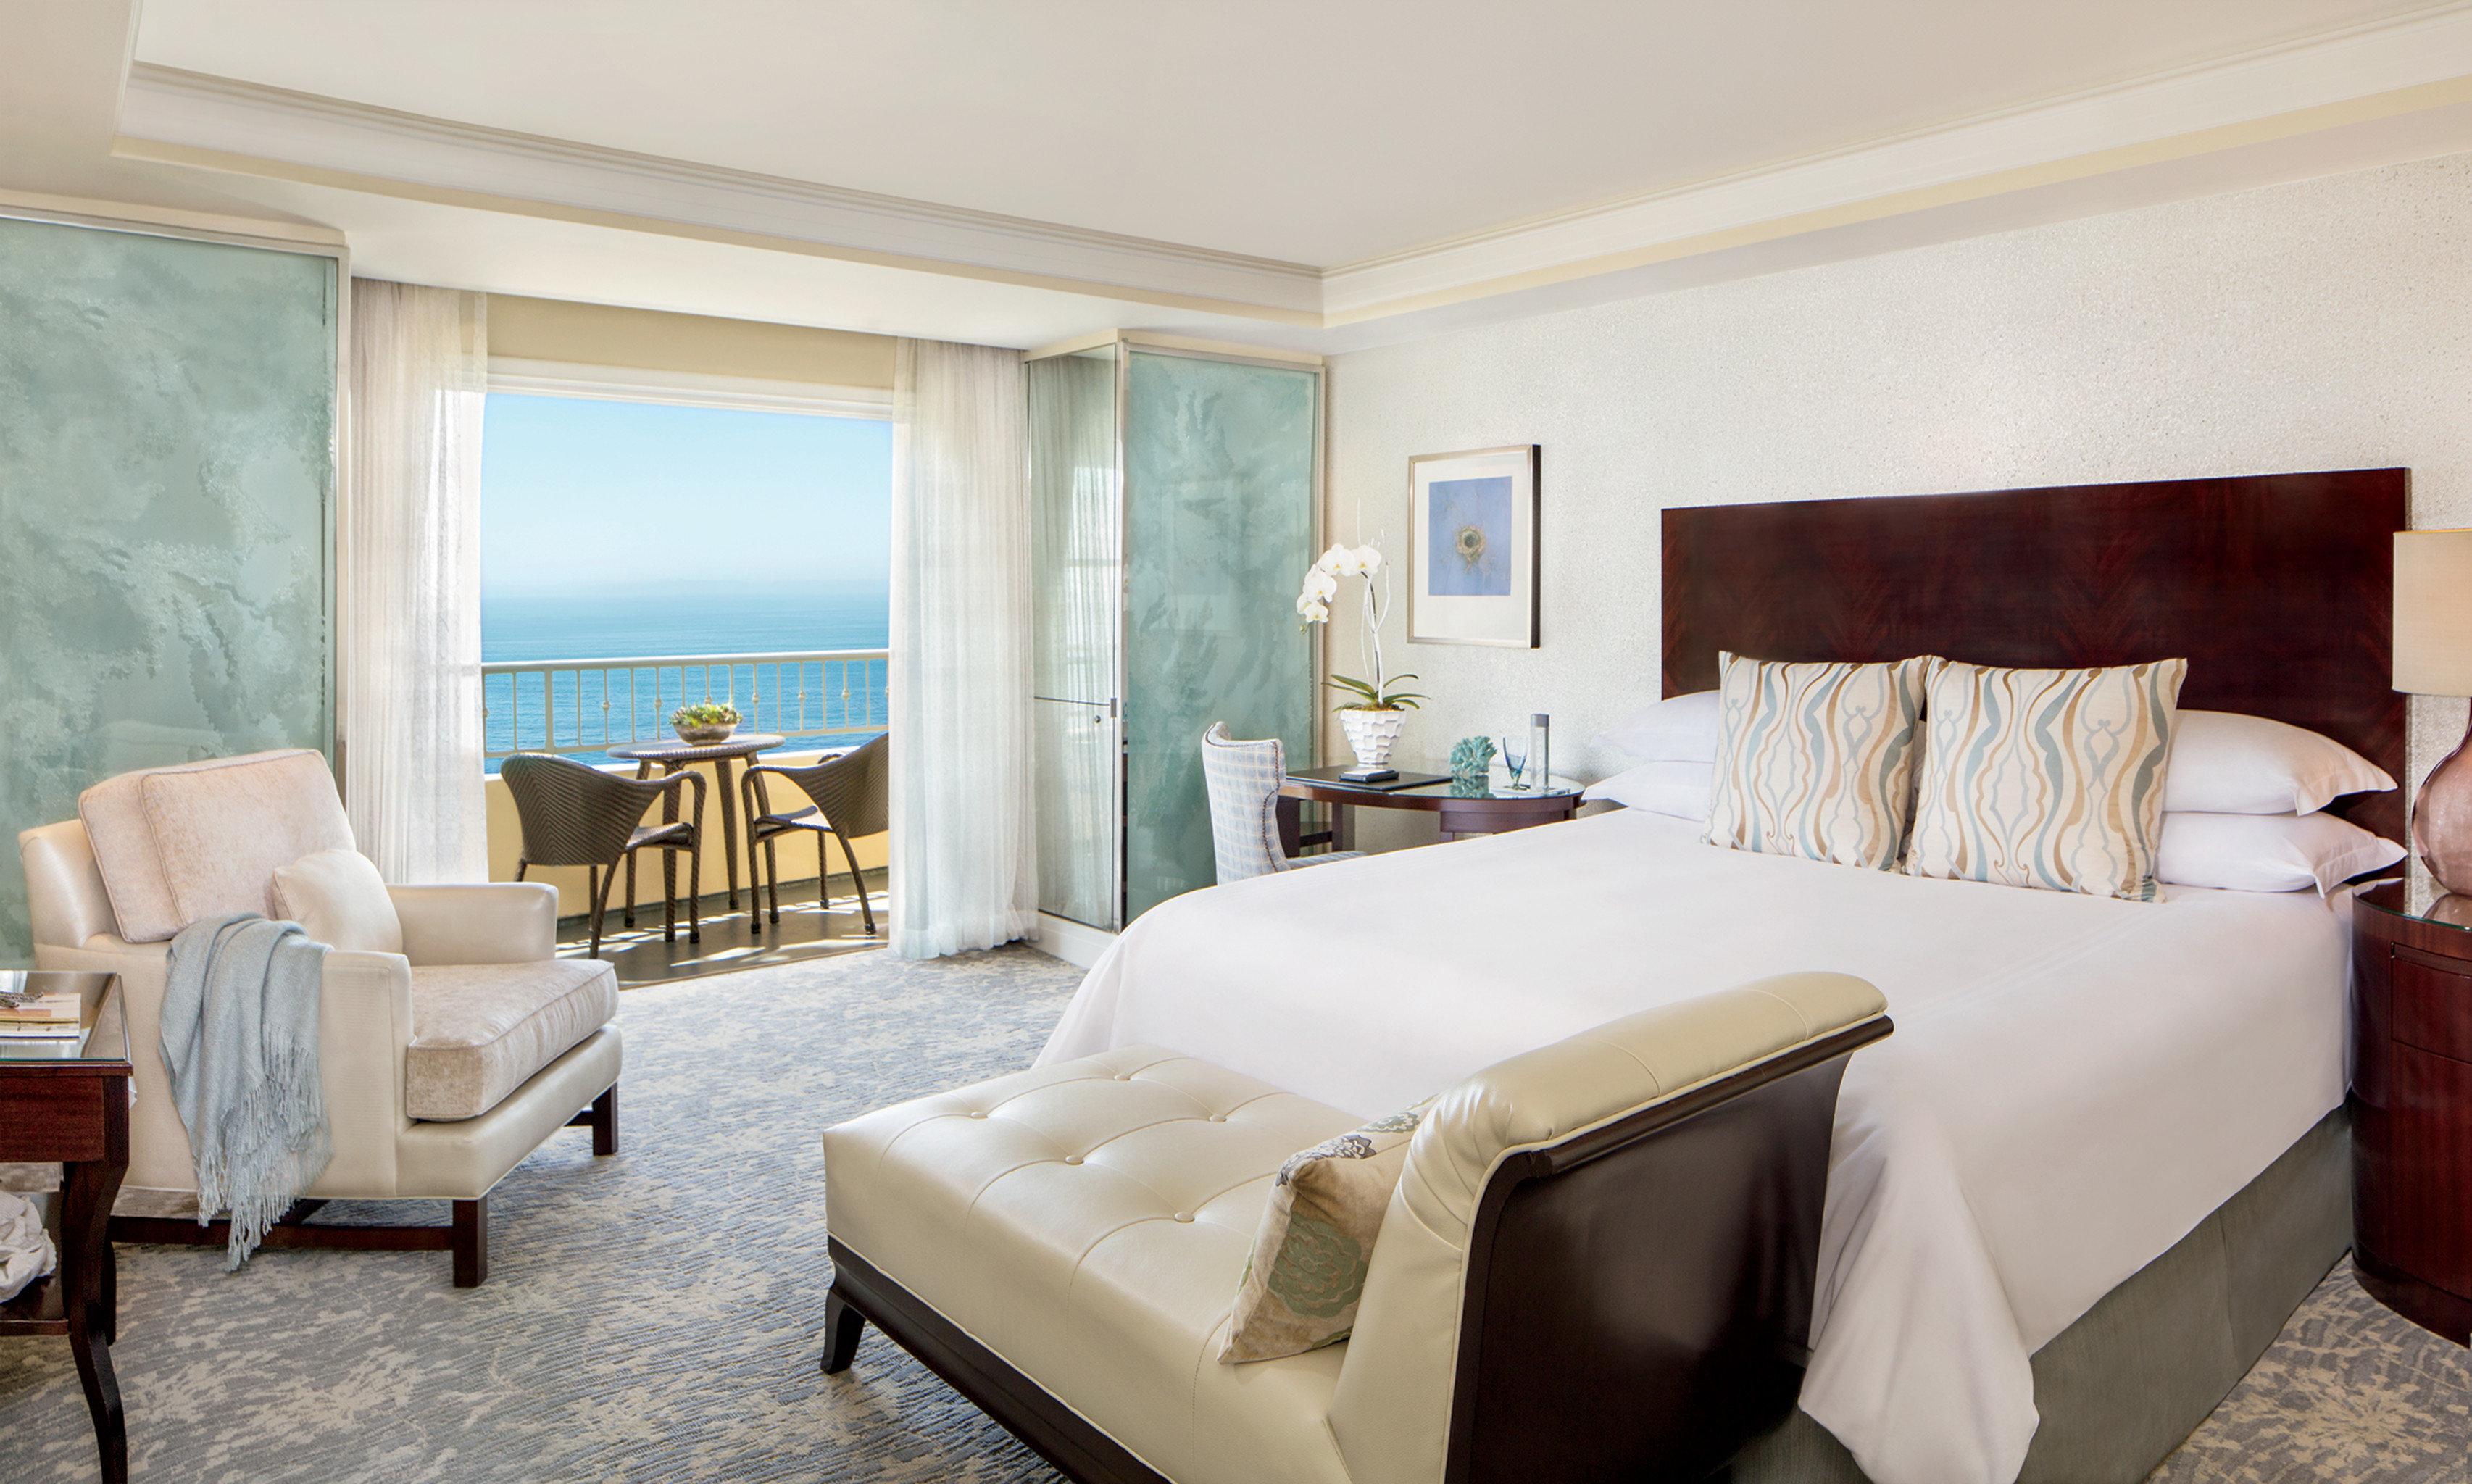 Balcony Bedroom Luxury Modern Scenic views Suite sofa property living room cottage Villa condominium containing